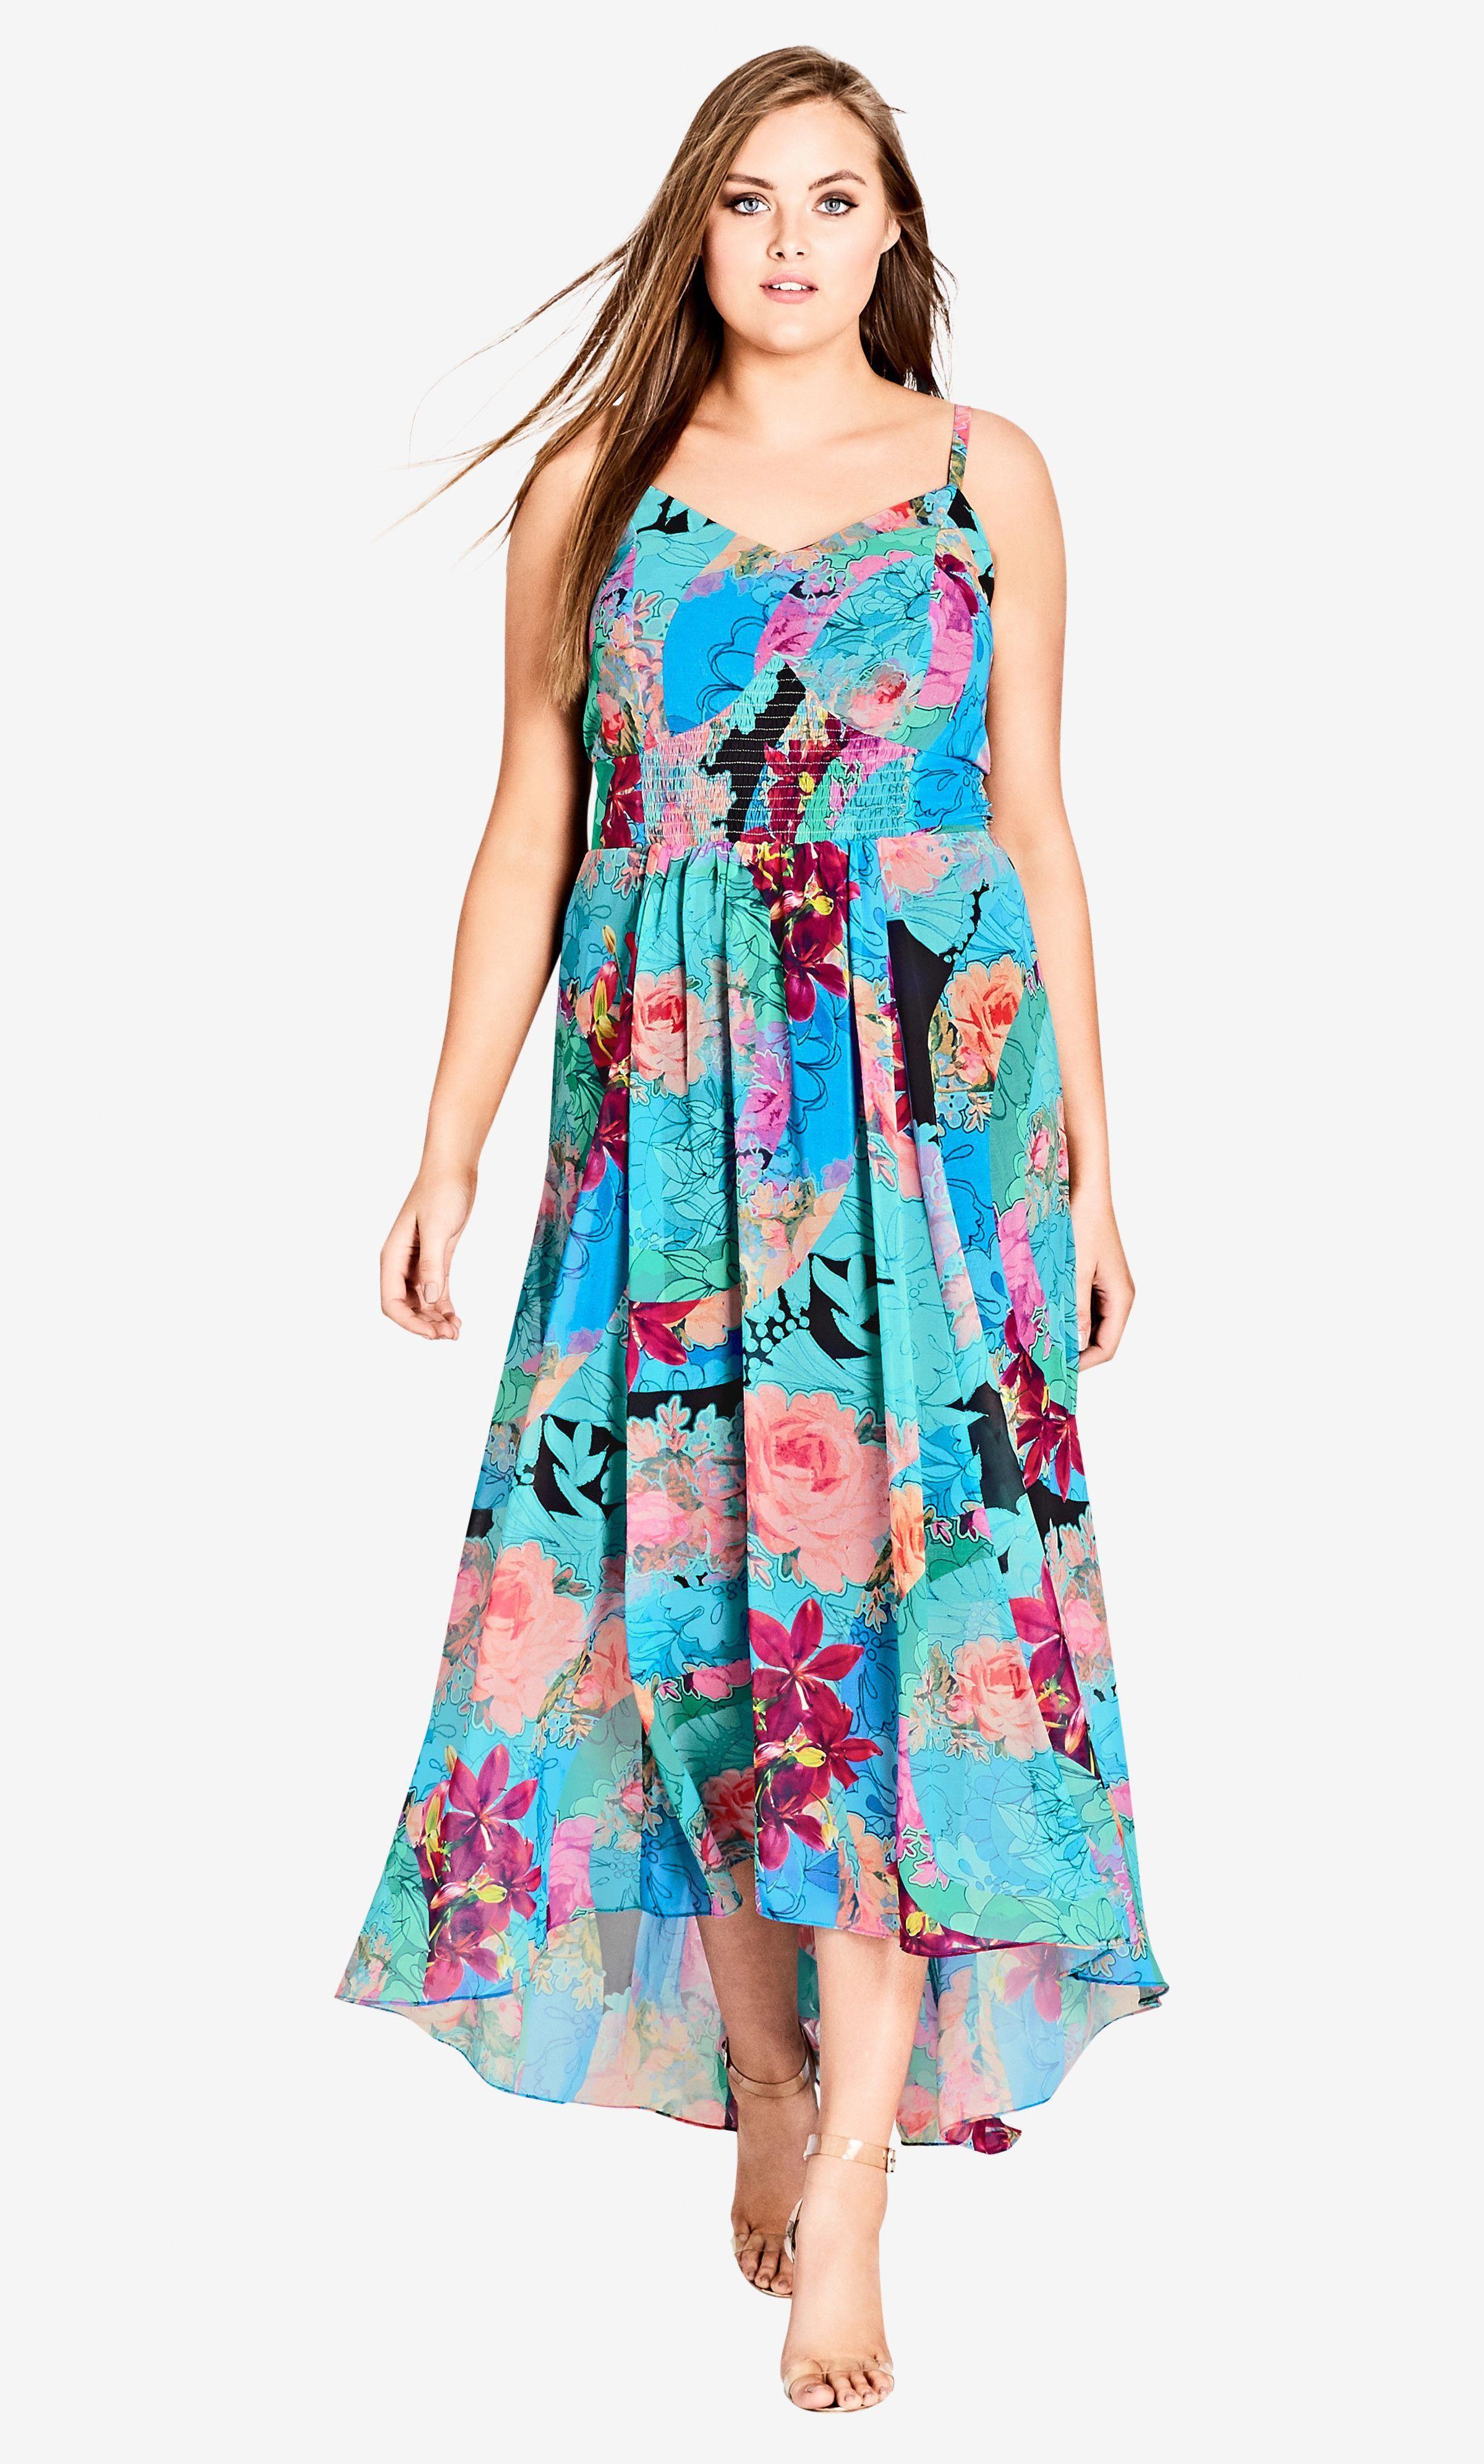 Plus Size Maxi Dresses Online Australia - raveitsafe